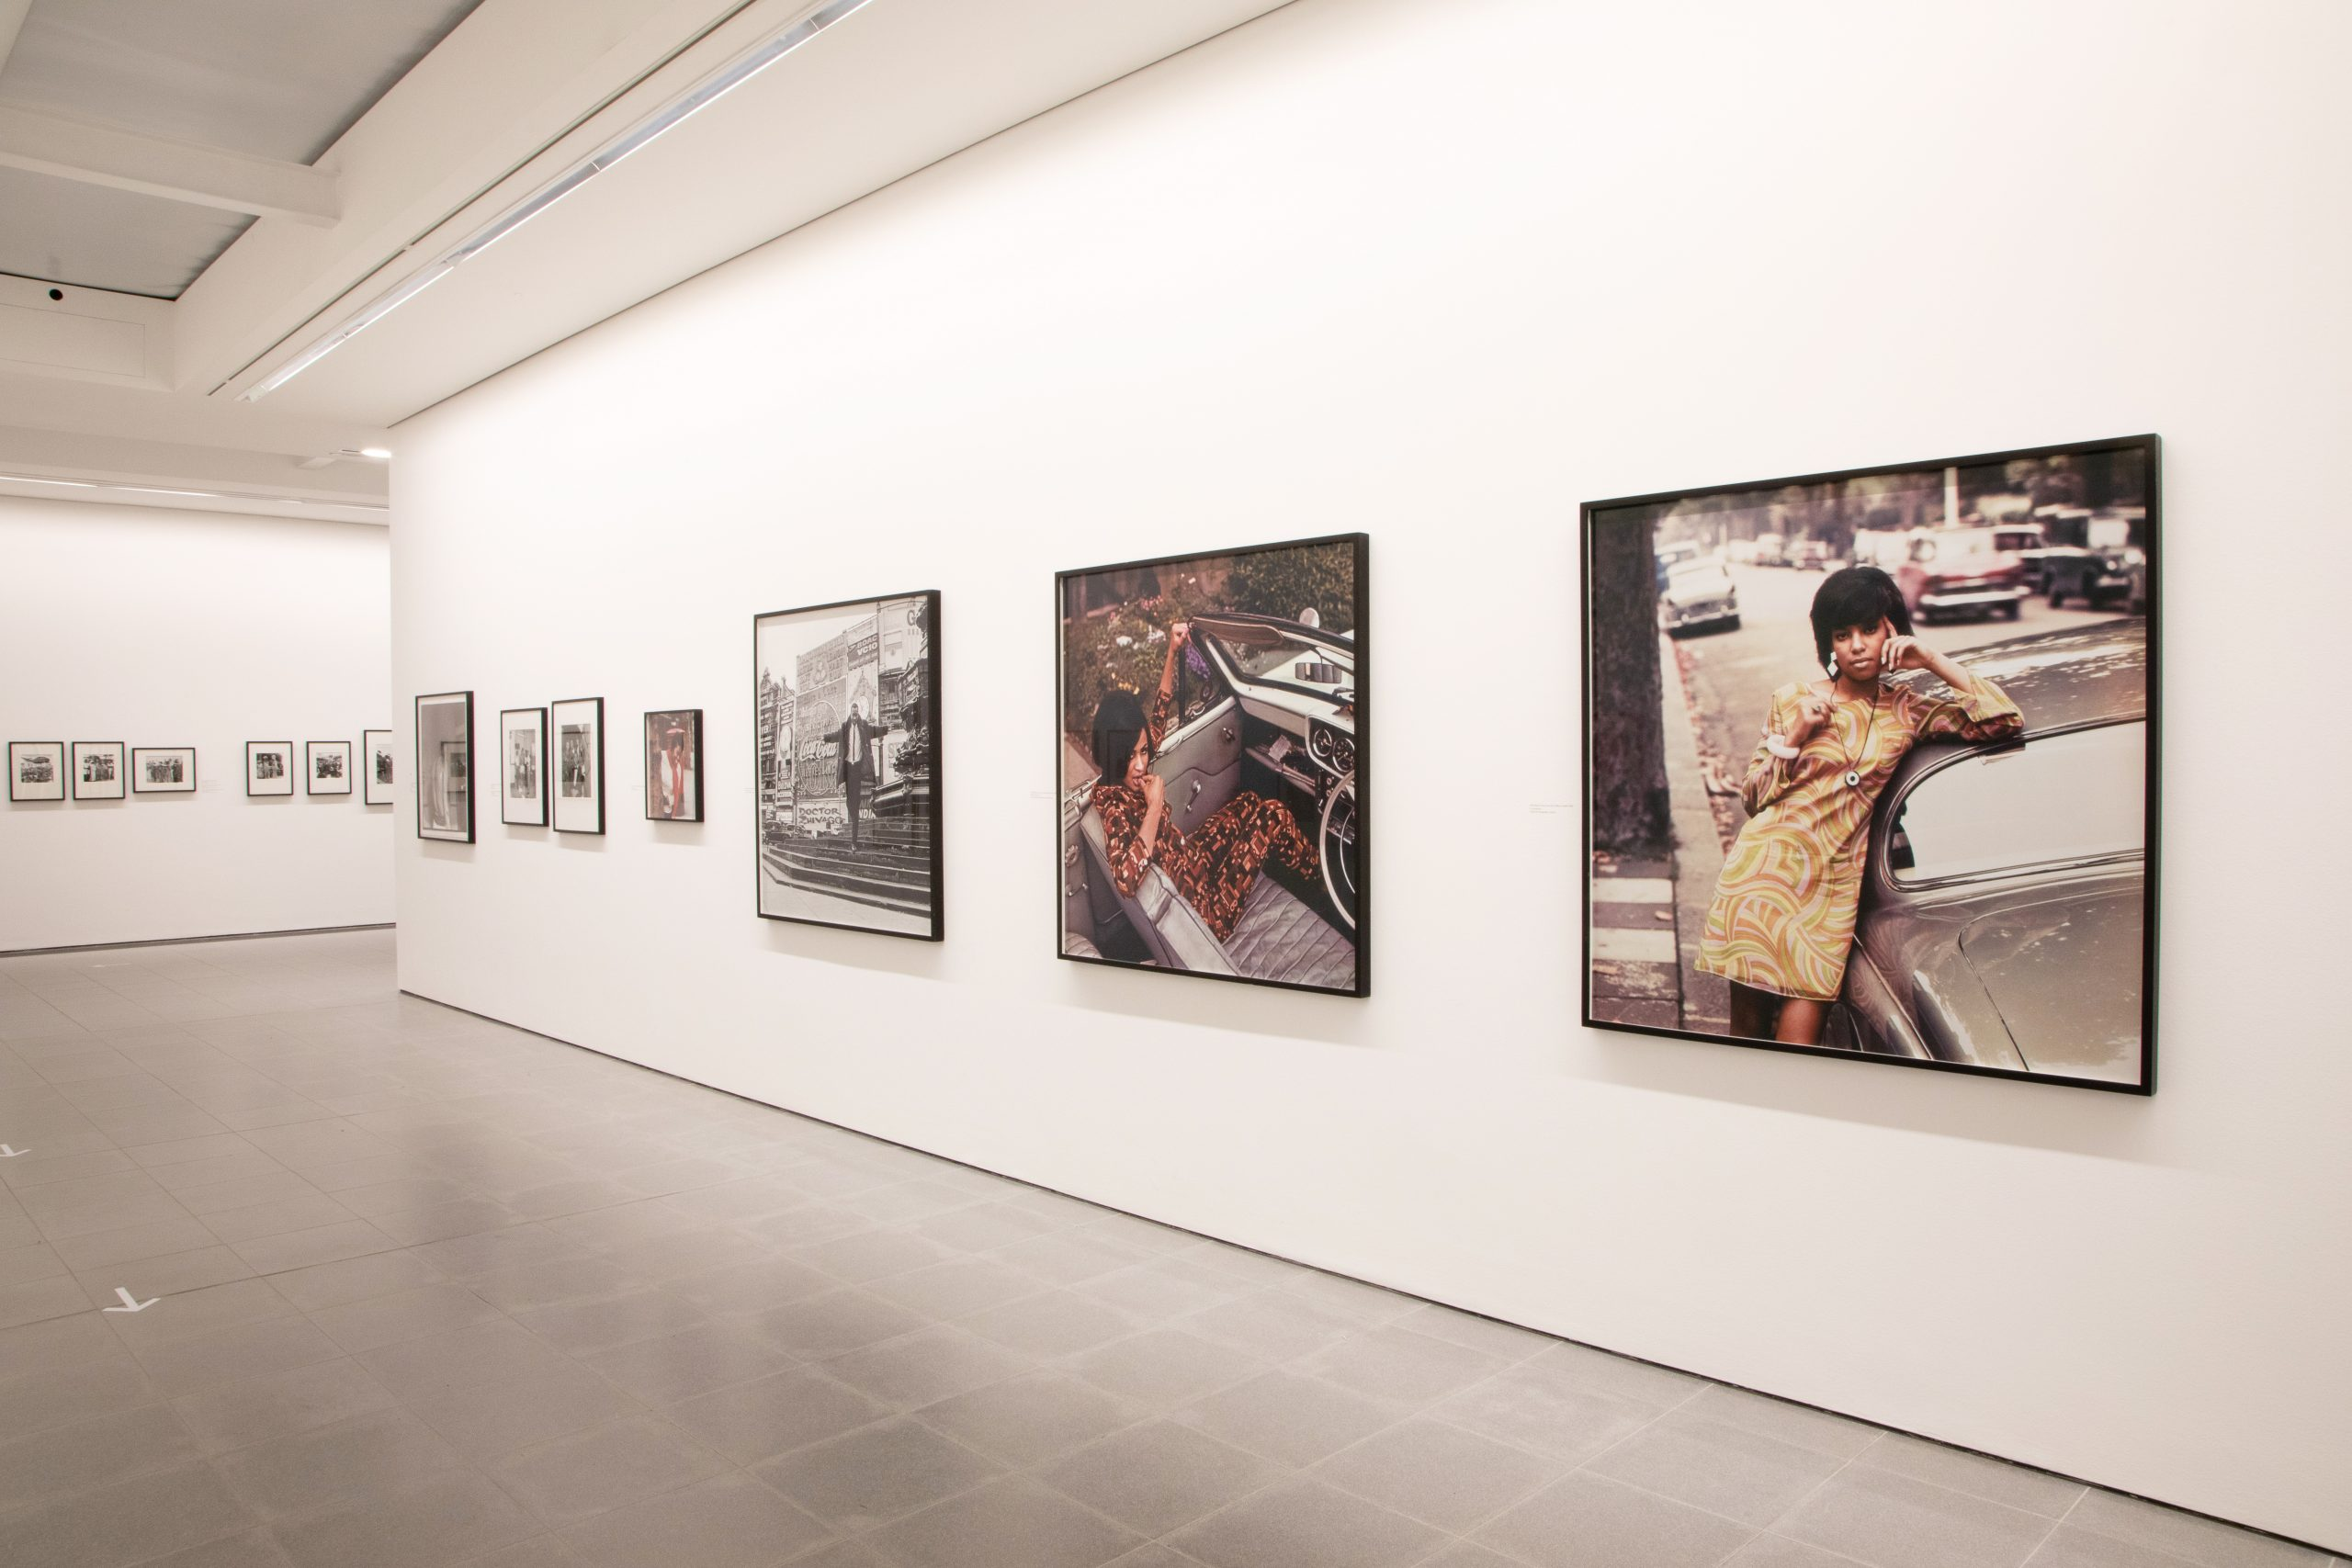 ames Barnor: Accra/London - A Retrospective (Installation view, 19 May – 24 October 2021, Serpentine).